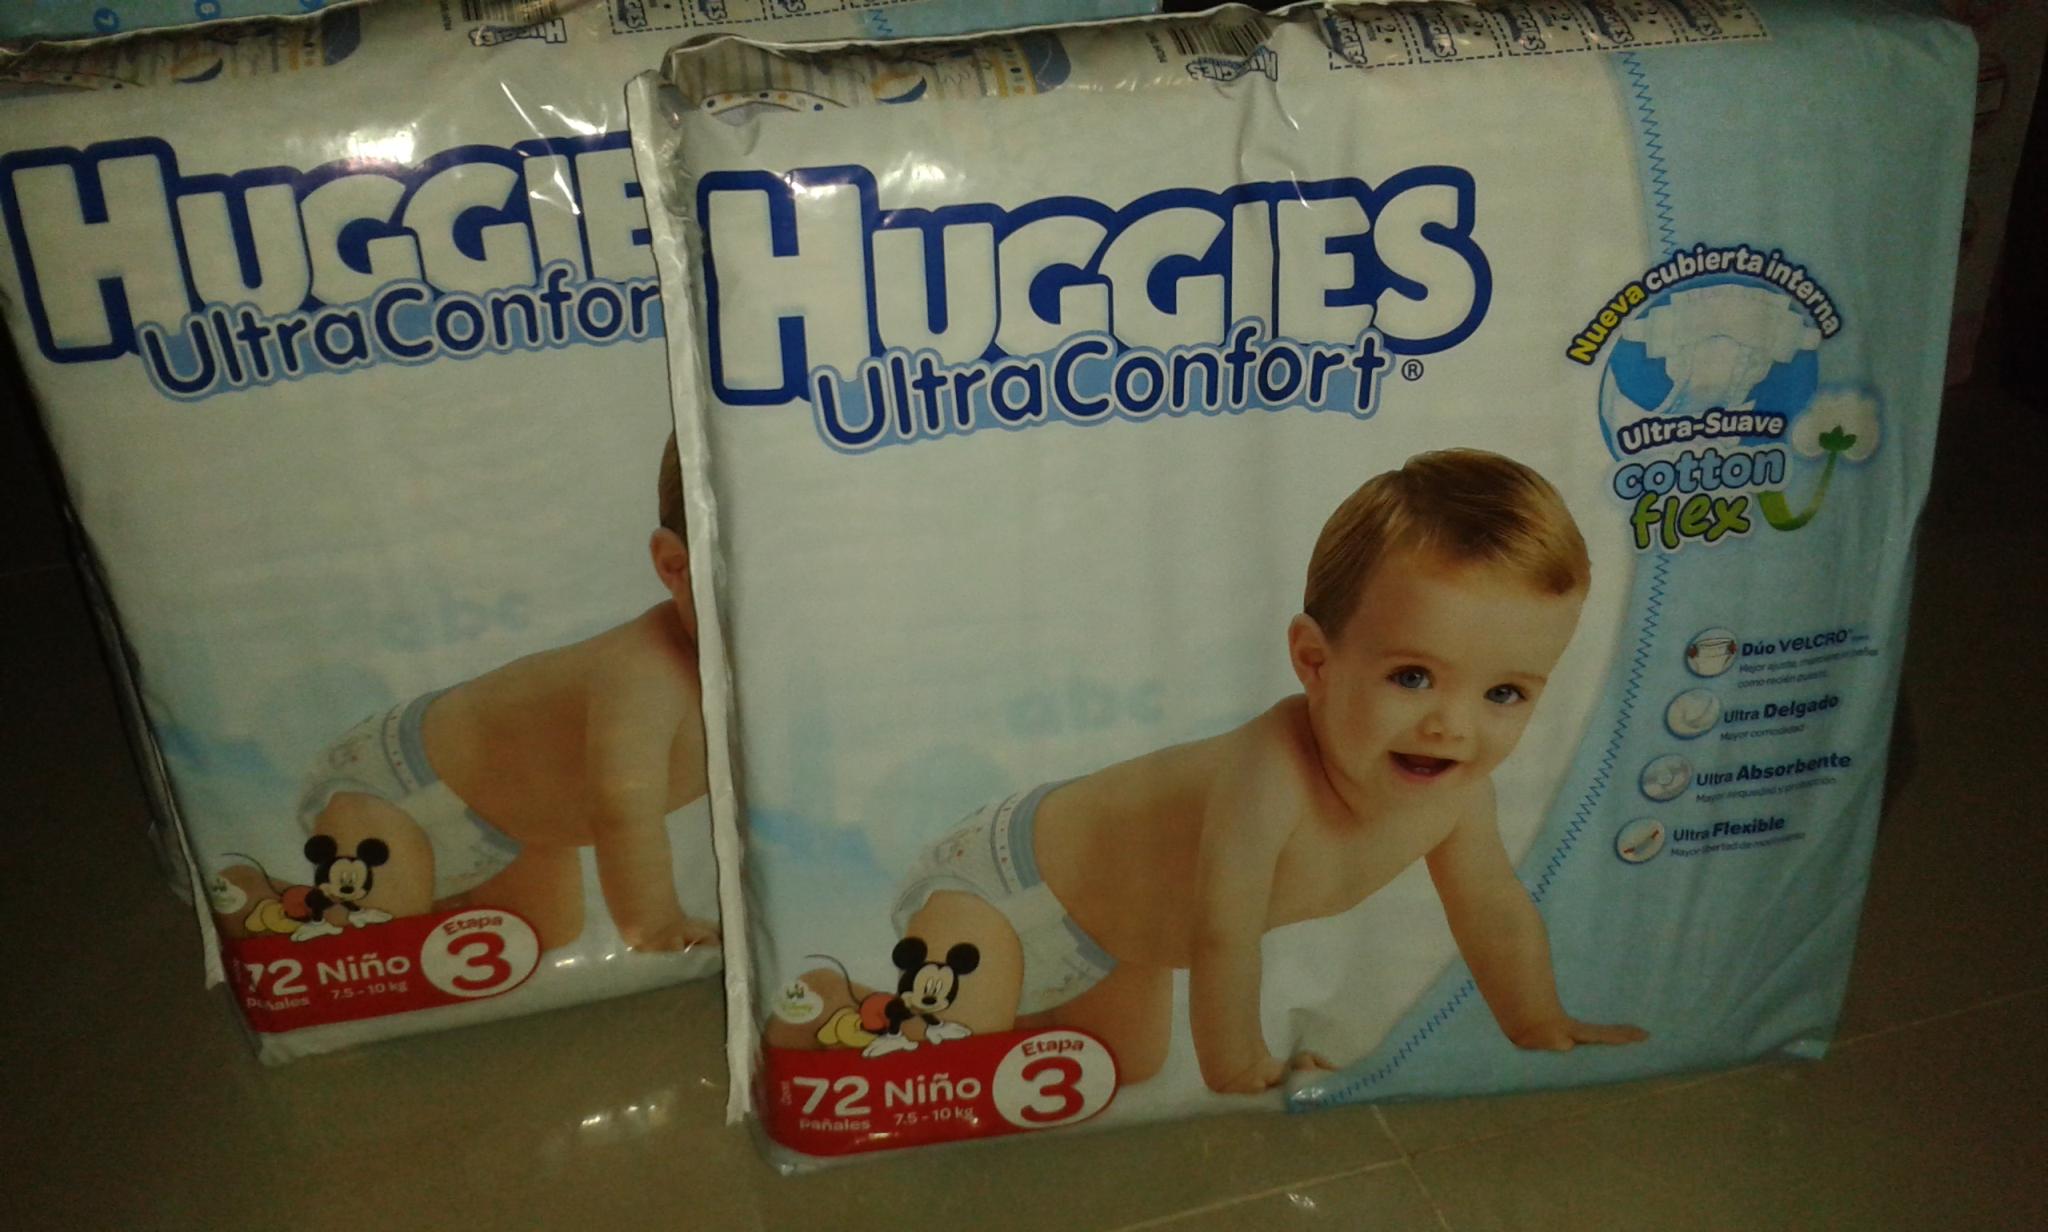 Chedraui: Pañales Huggies Ultraconfort 72pzas talla 3 para niño a 26 pesos